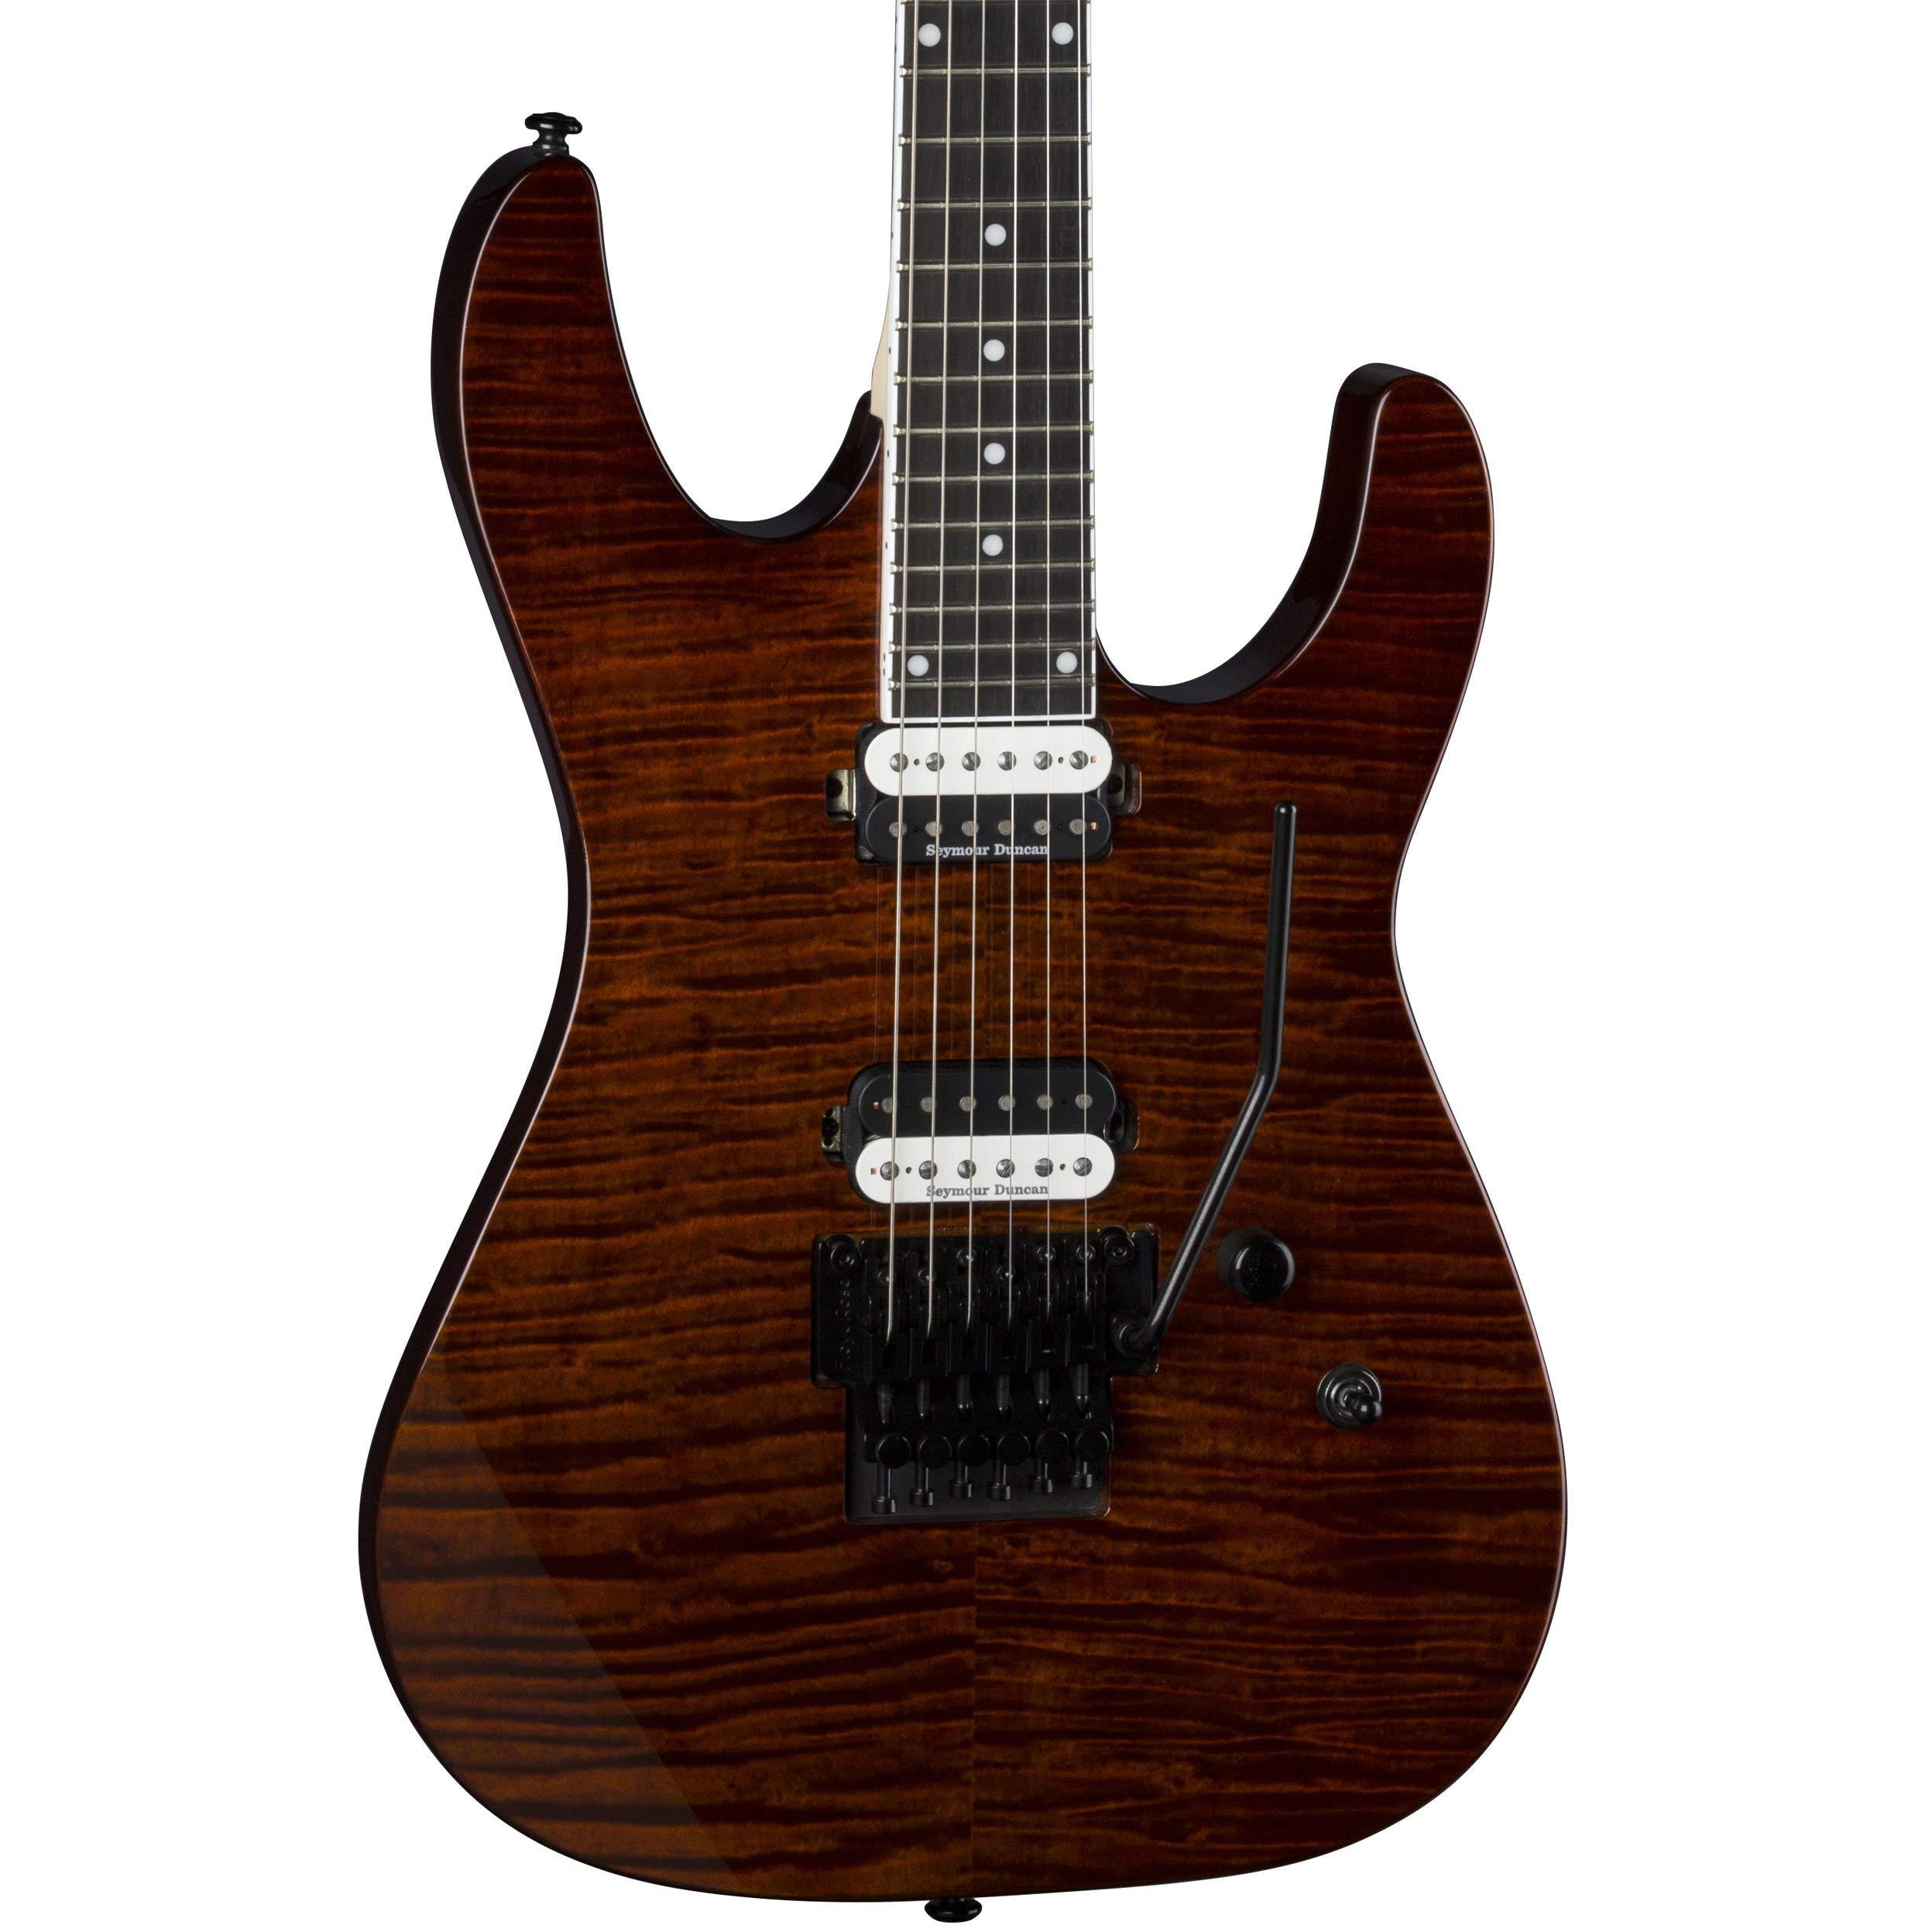 Cheap Dean Modern 24 Select Flame Top Floyd Rose Electric Guitar Tiger Eye Black Friday & Cyber Monday 2019